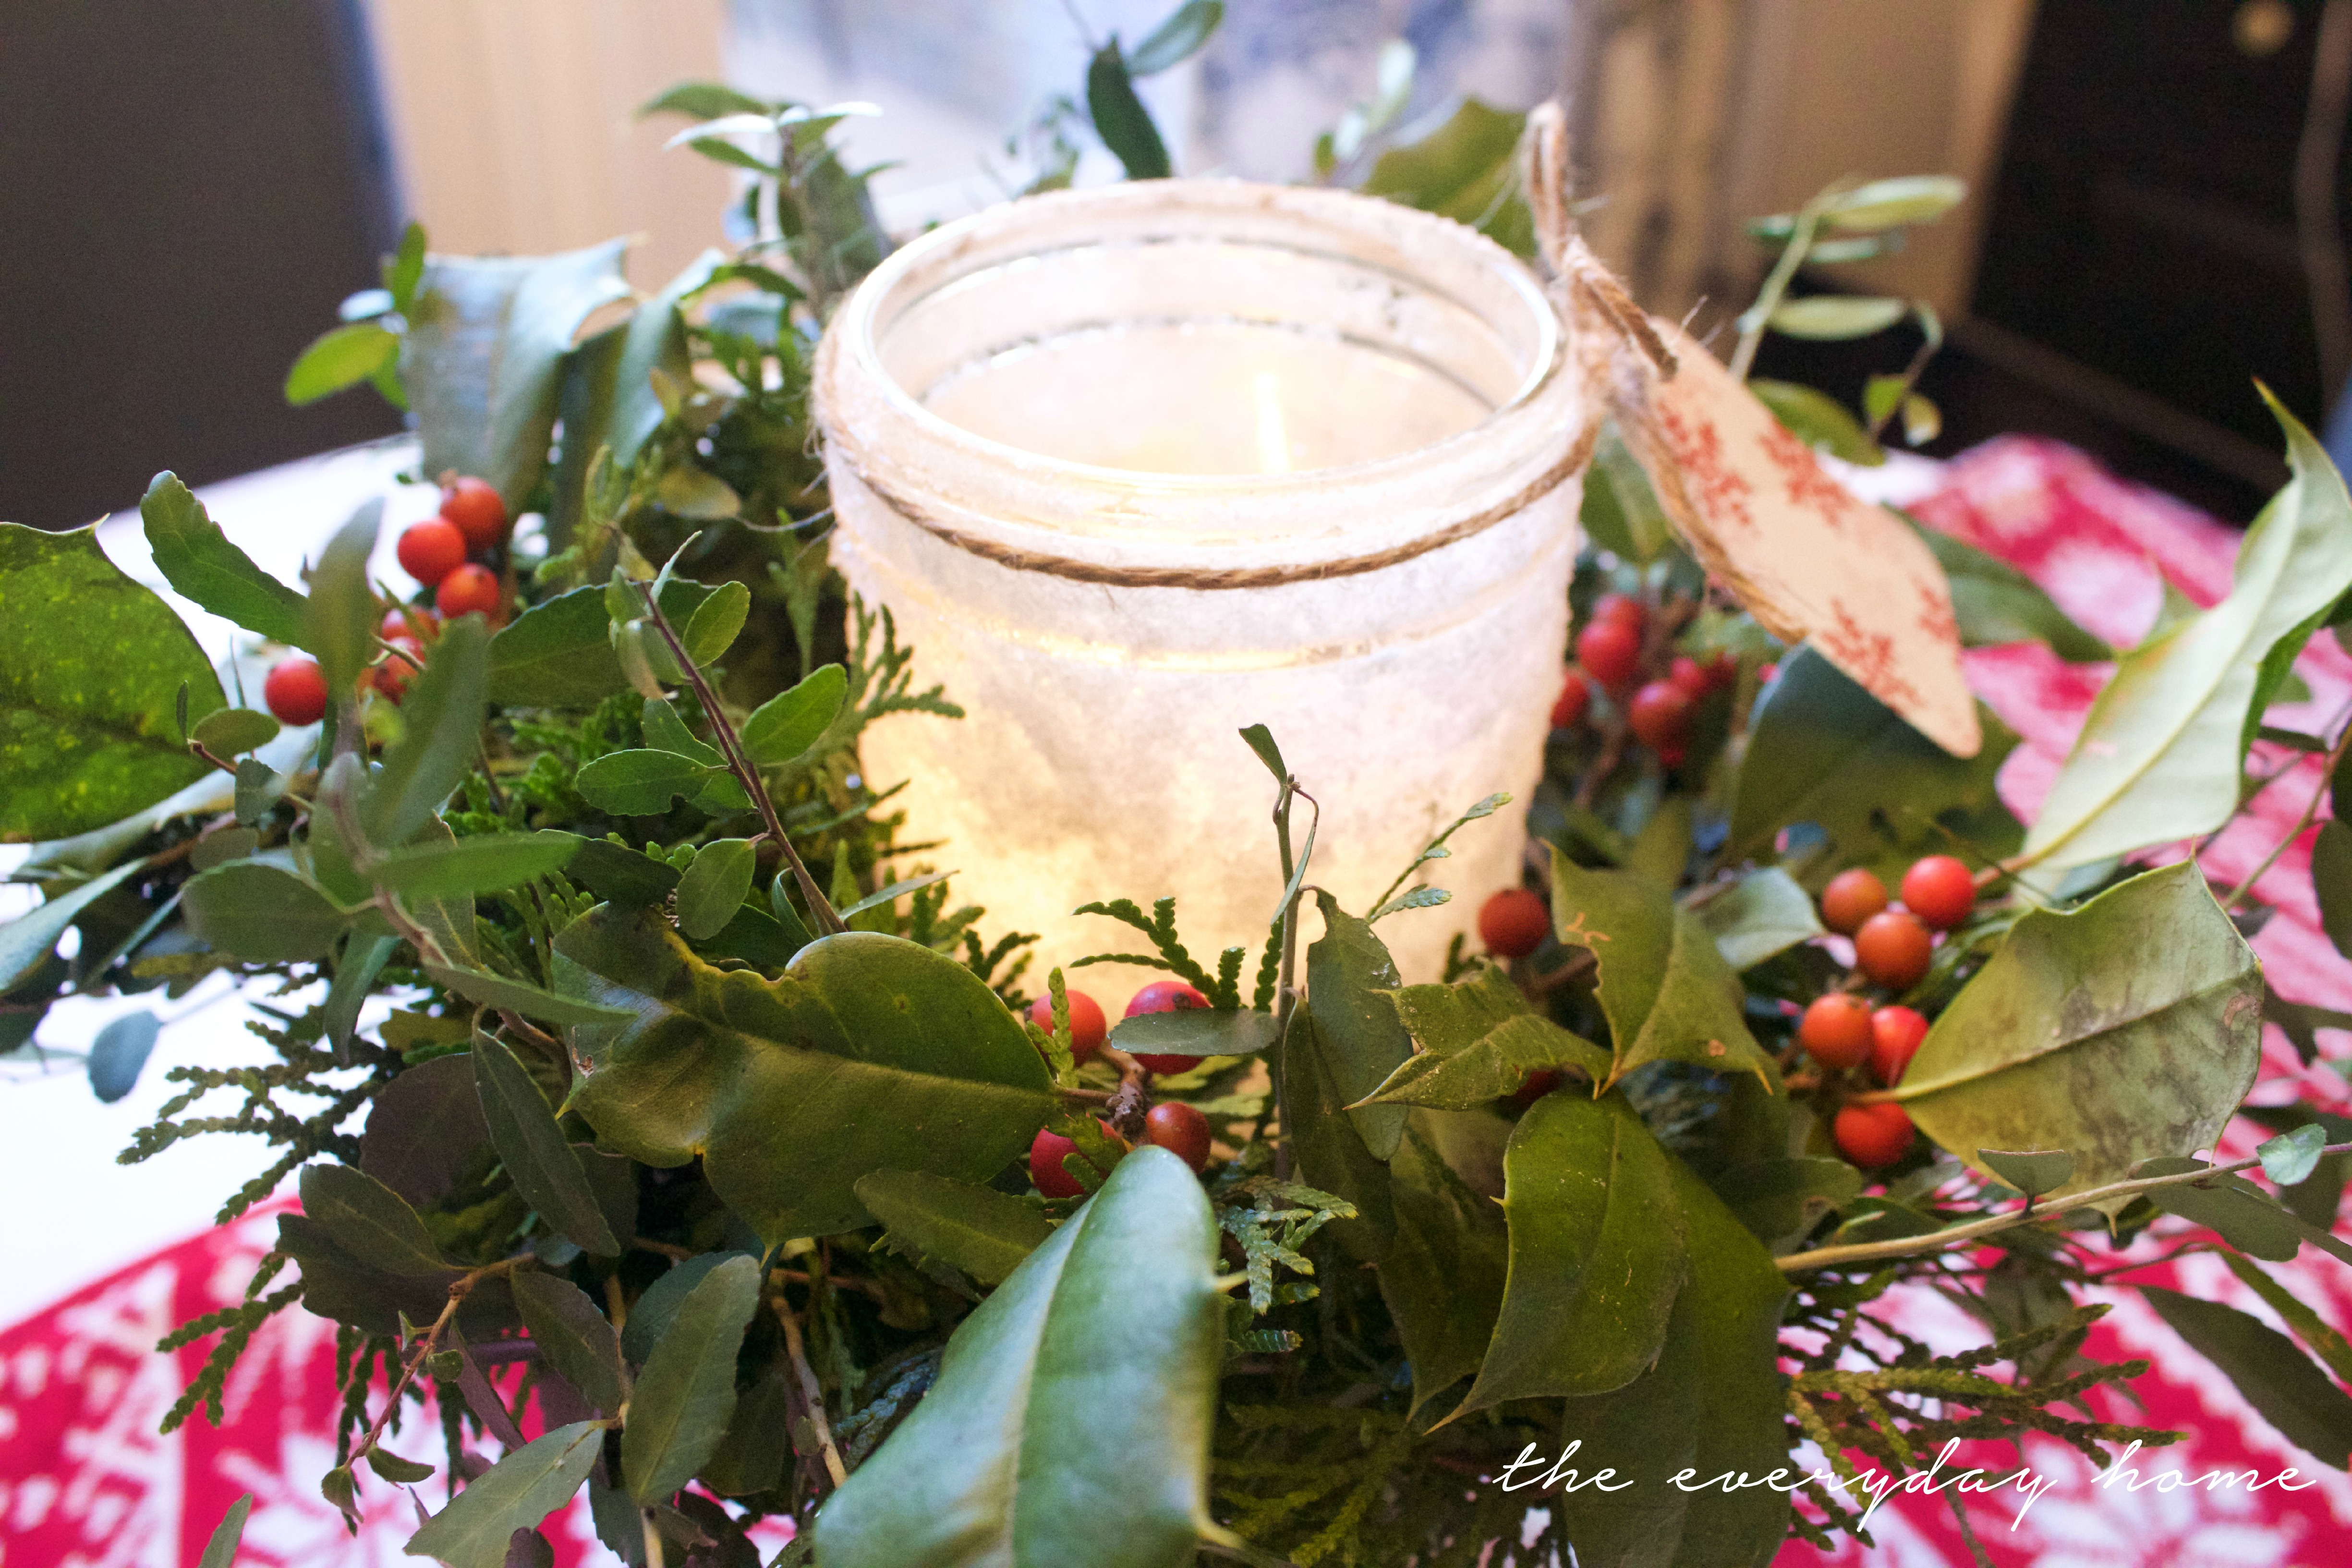 DIY Iced Mason Jar Candle | The Everyday Home Blog | www.everydayhomeblog.com